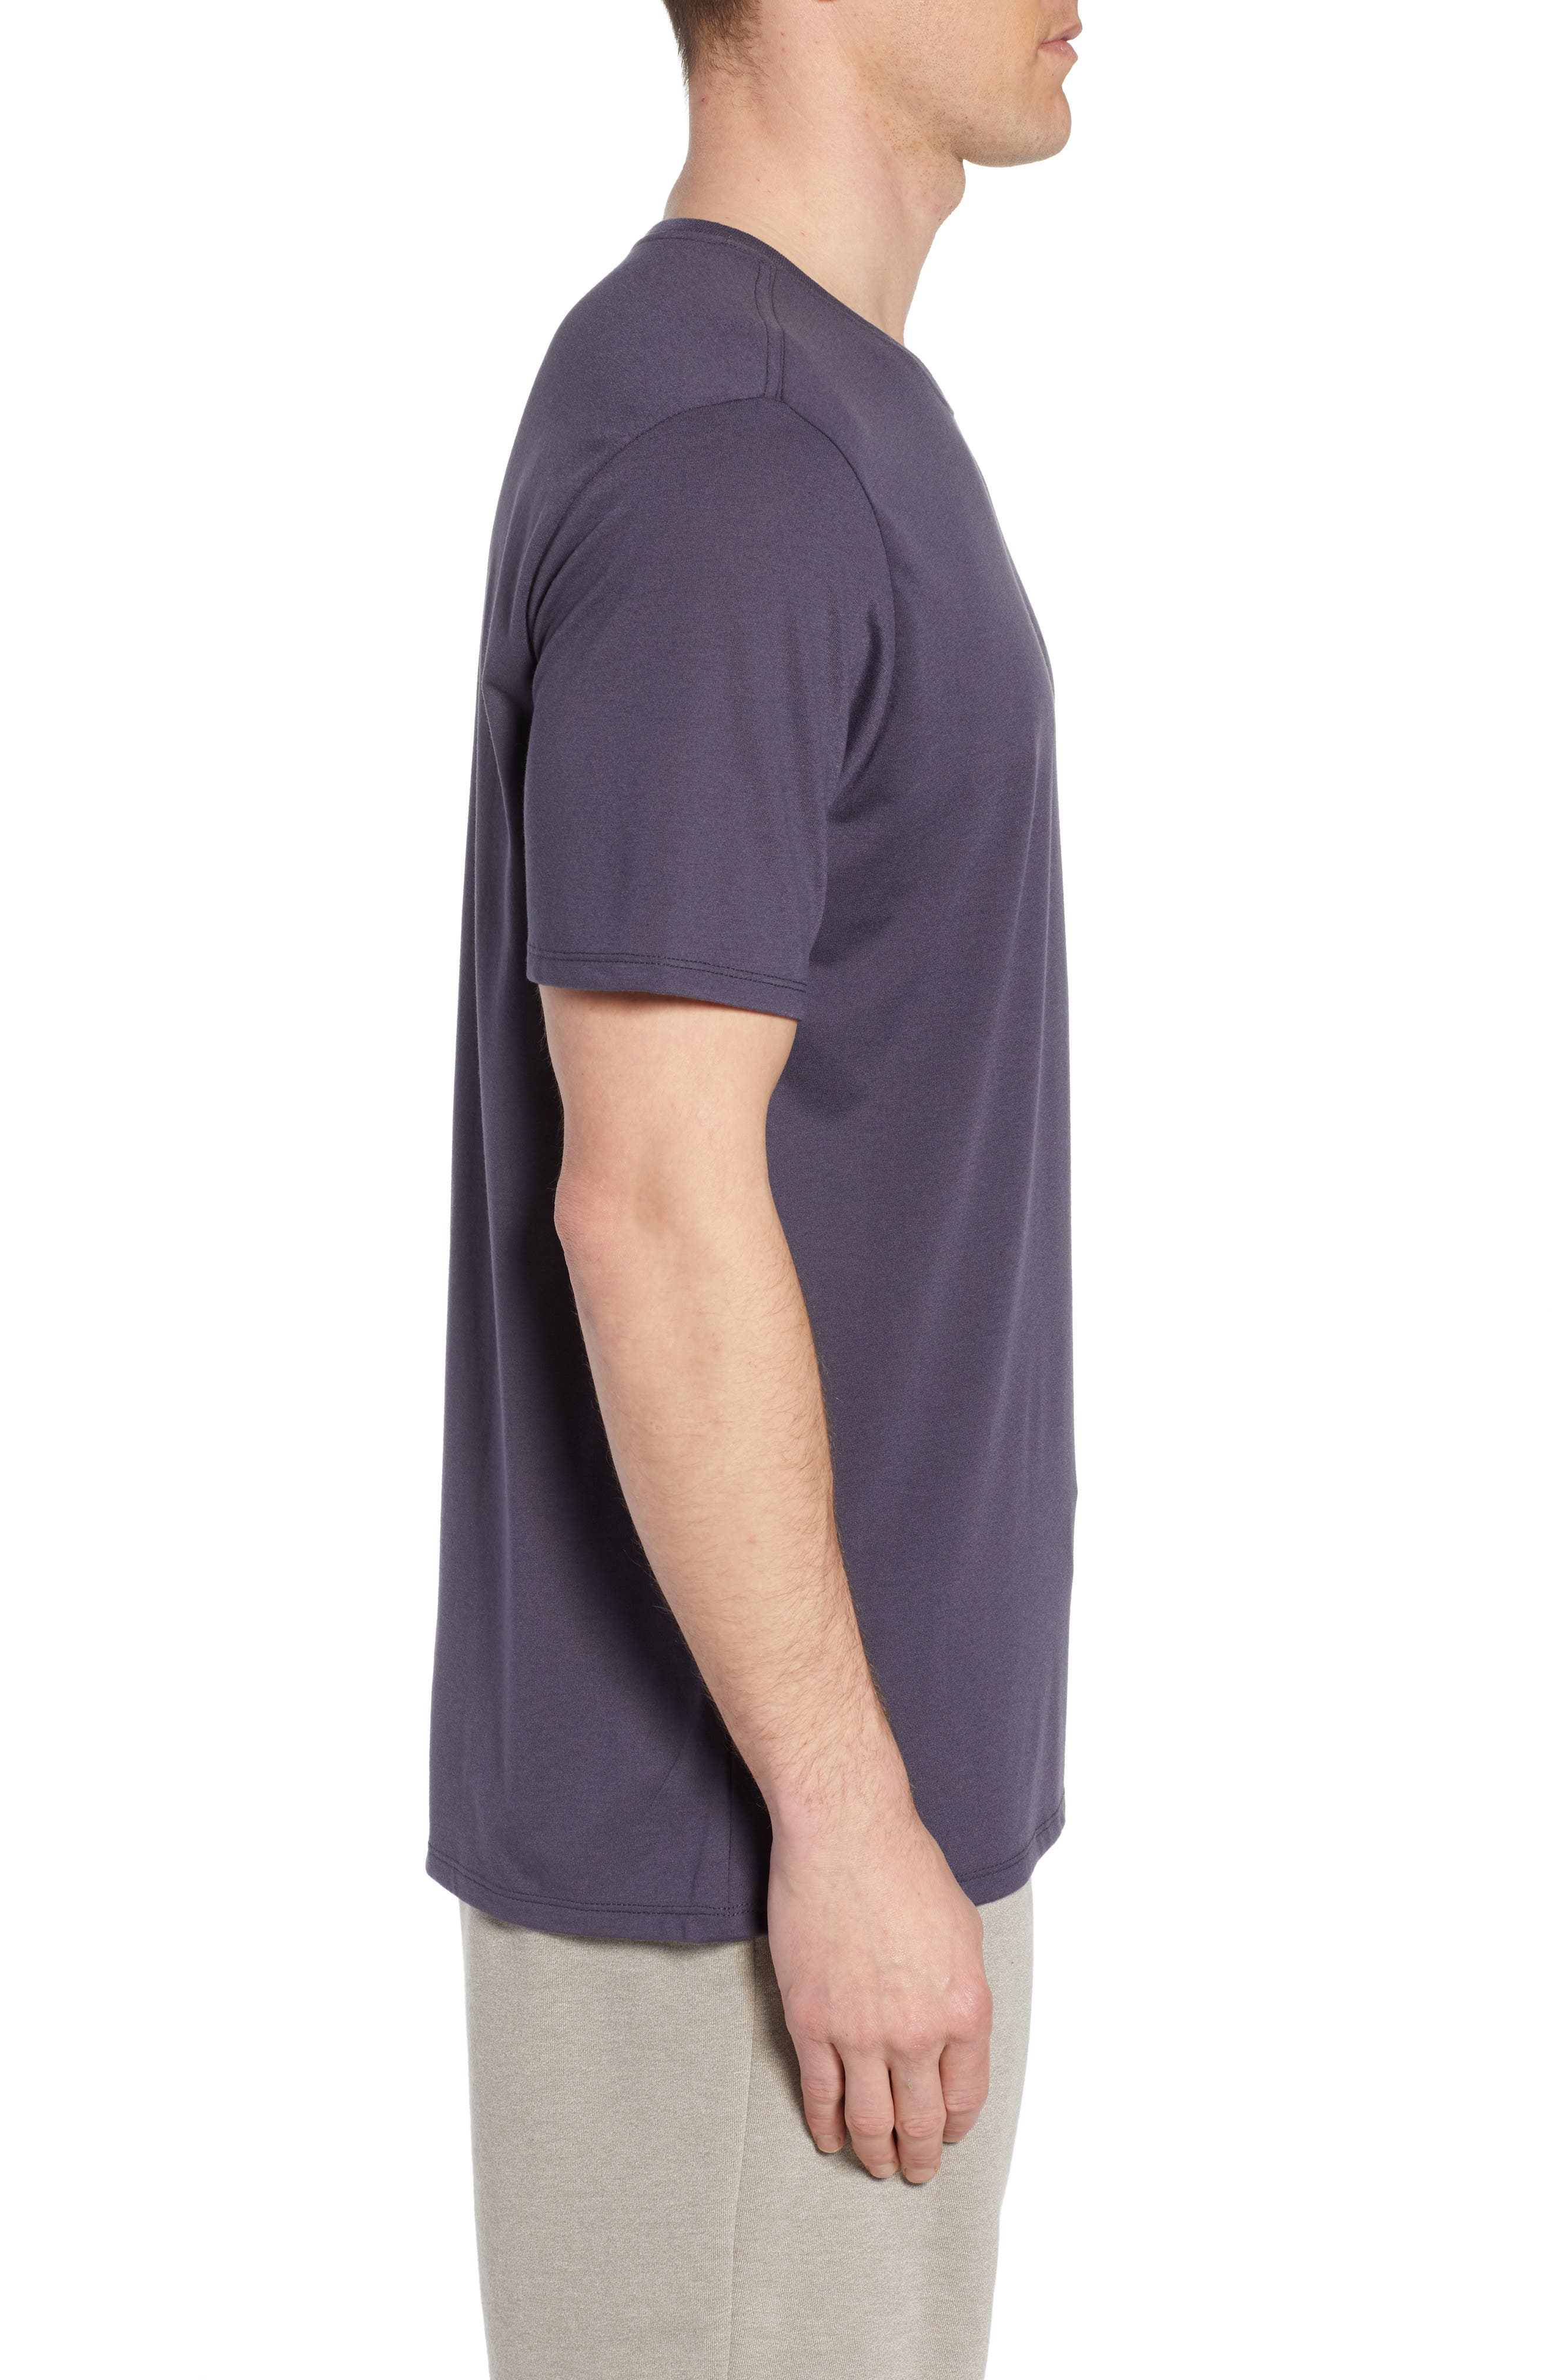 Dry Running Division T-Shirt,                             Alternate thumbnail 3, color,                             GRIDIRON/ GUNSMOKE